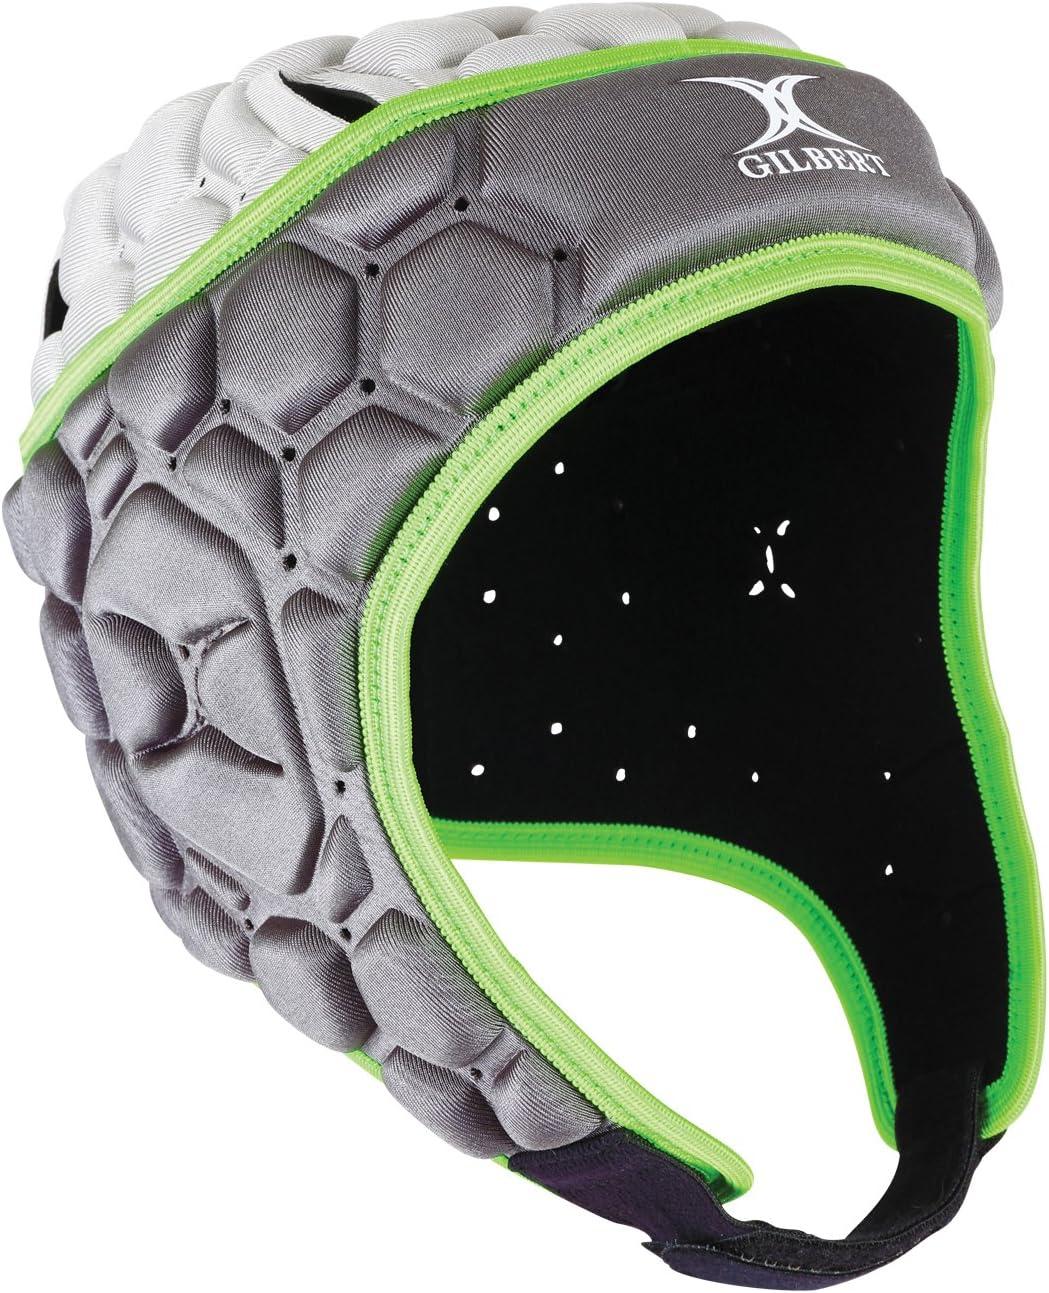 Gilbert Falcon 200 Headguard : Sports & Outdoors